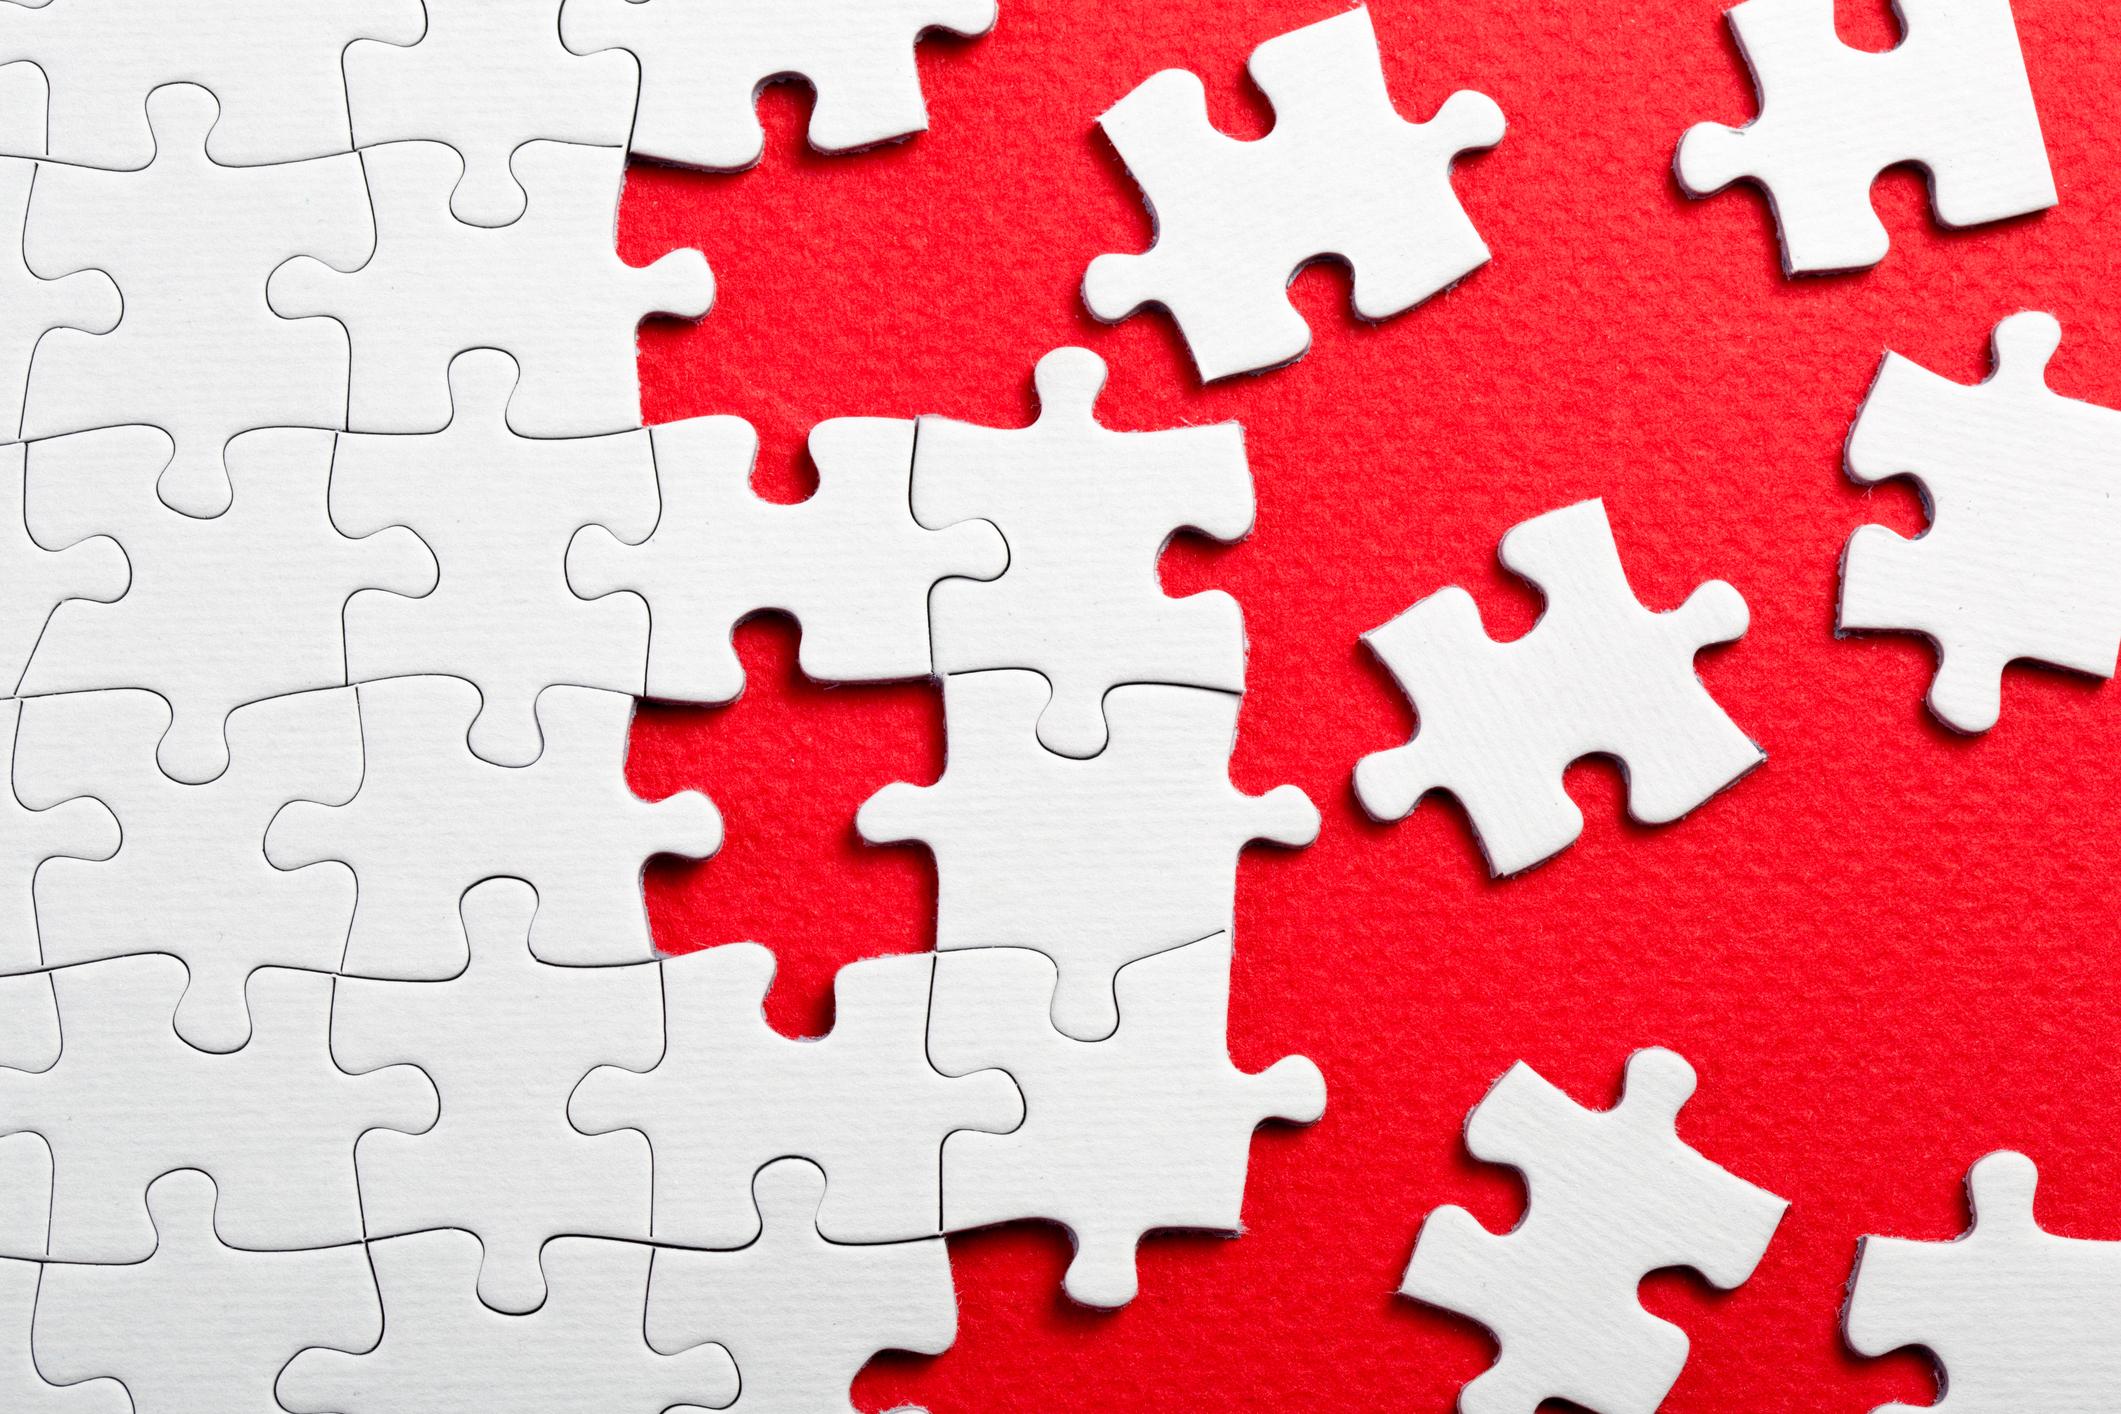 36-1-adult-health-adhd-mind-explained-slideshow-36-puzzle-pieces-ts ... 5841da479